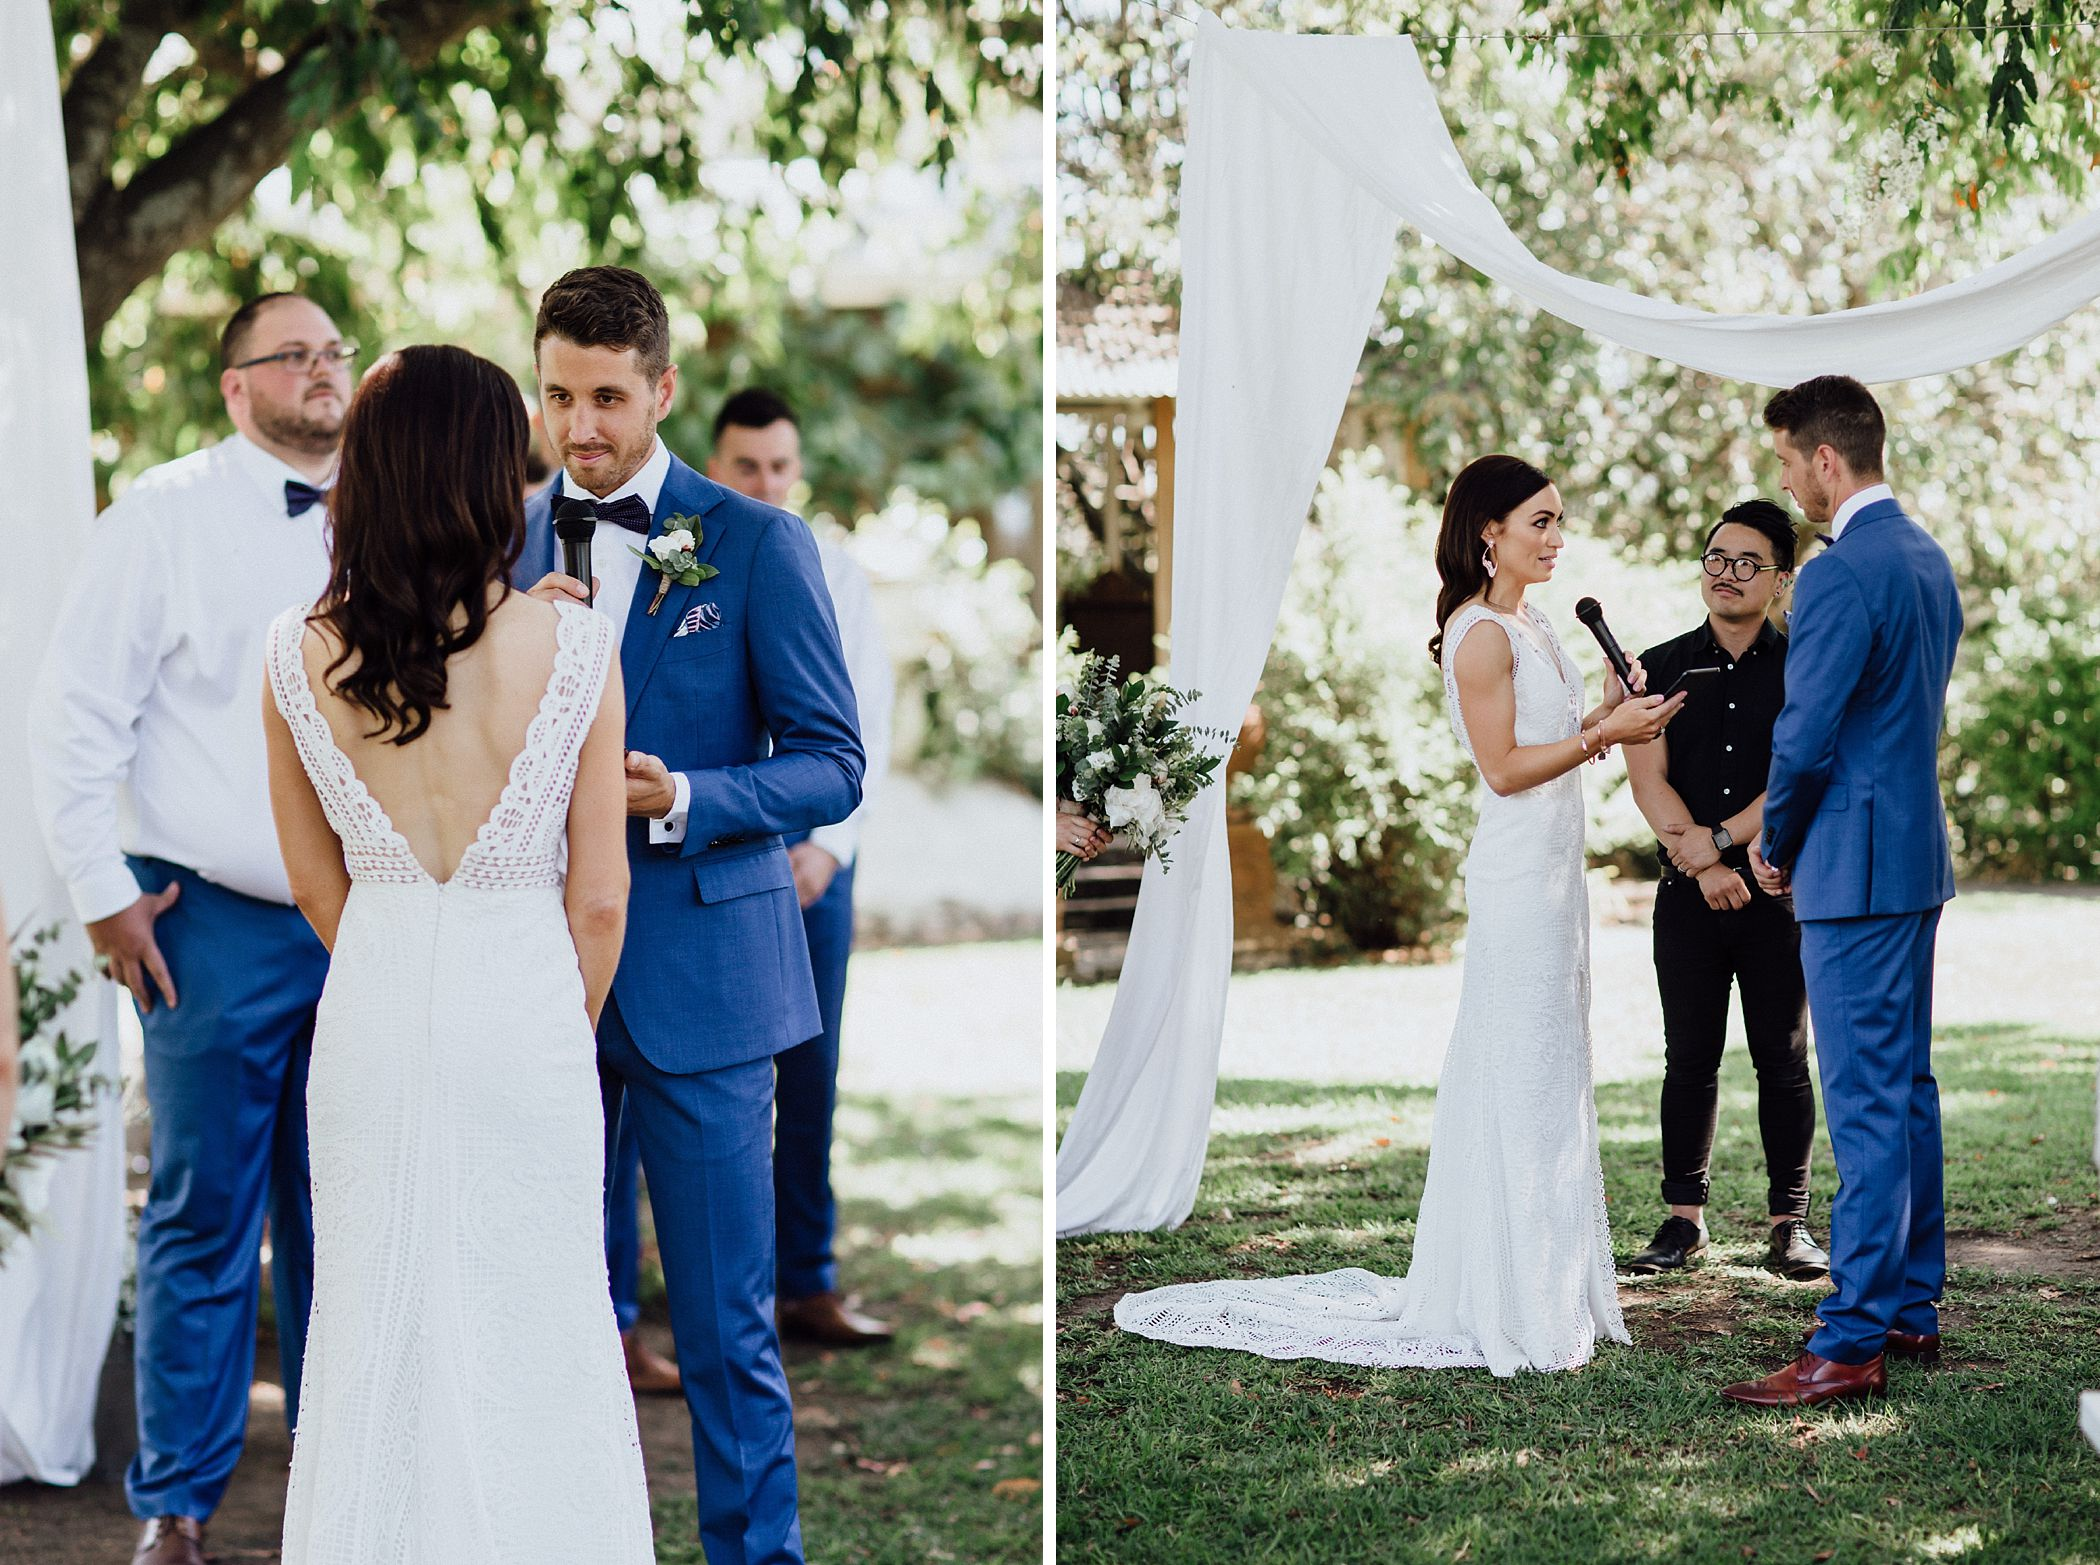 lauren-anne-photography-newcastle-wedding-photographer-mindaribba-house_0032.jpg